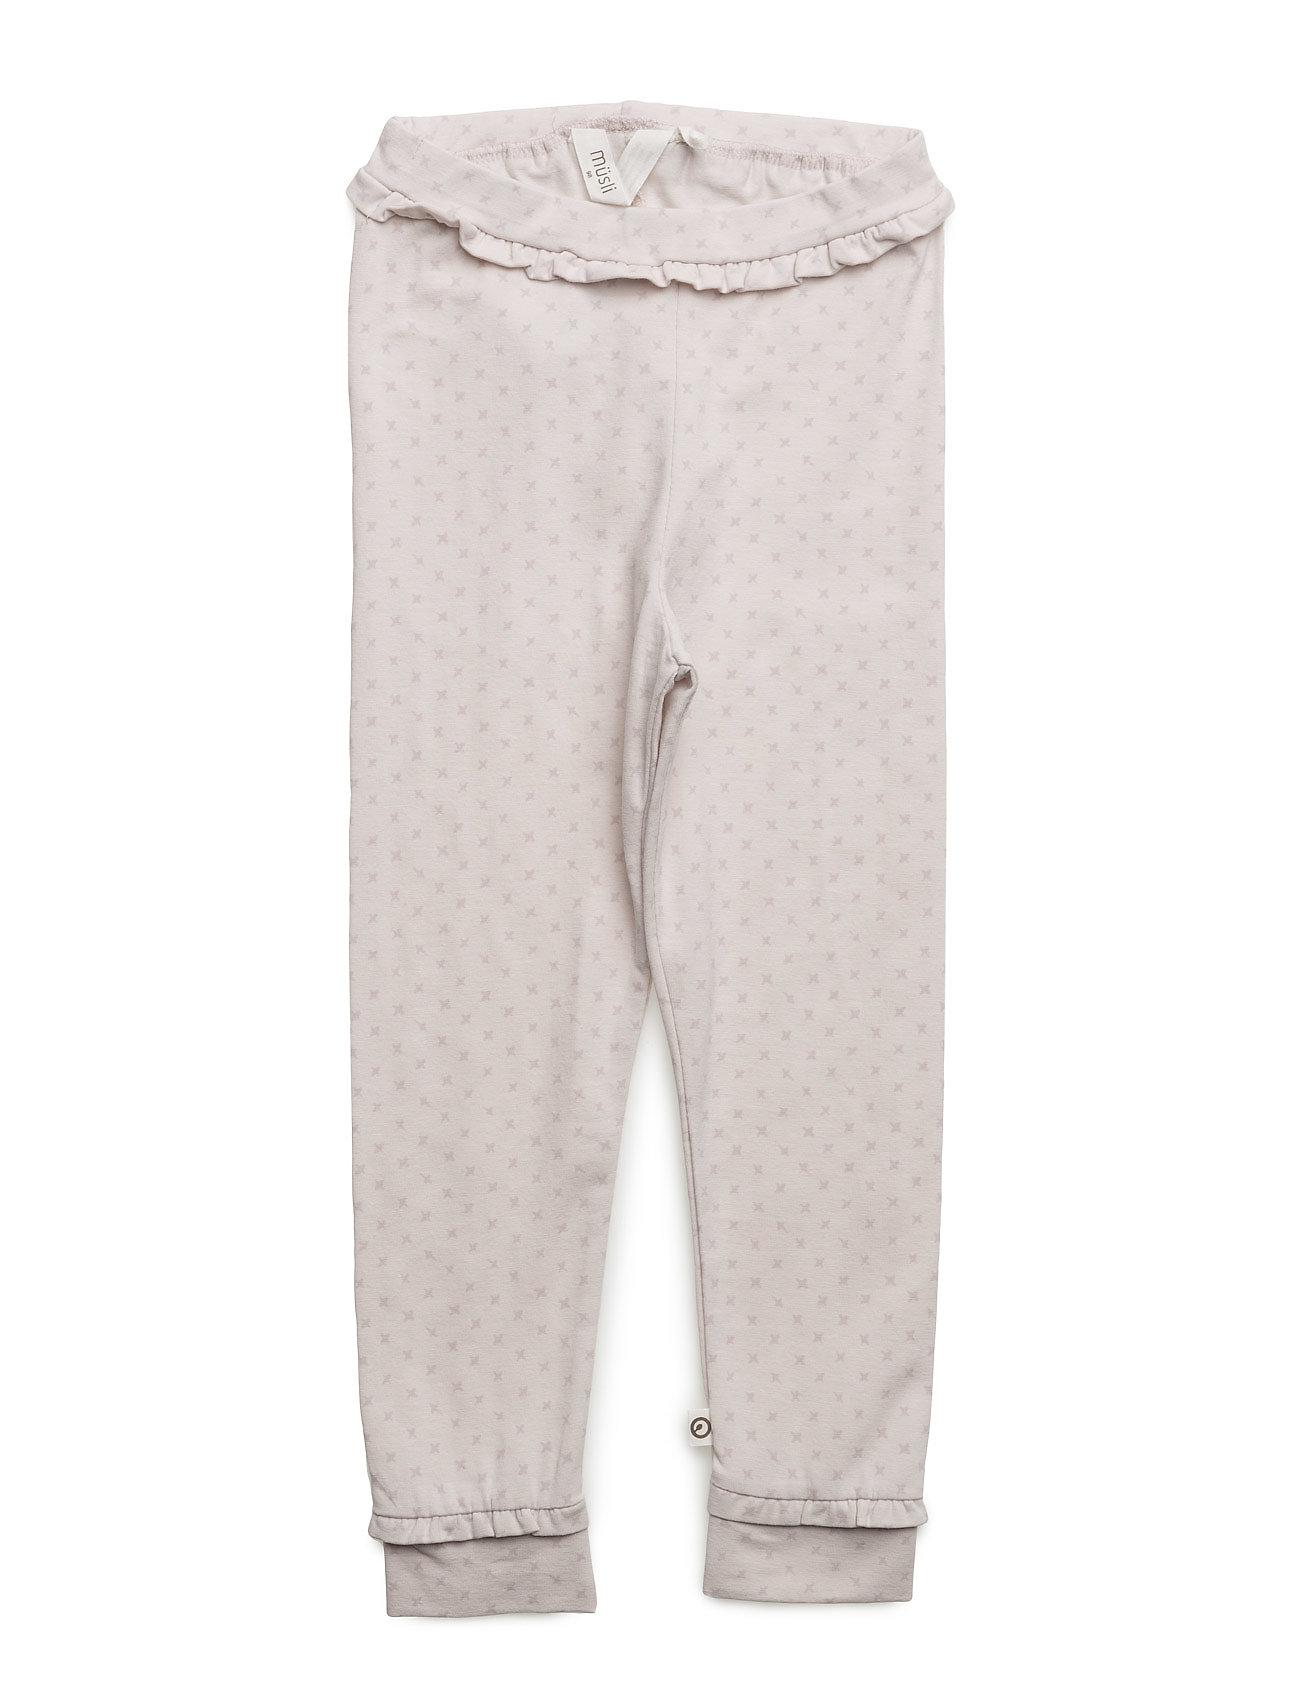 Cross Frill Pants Müsli by Green Cotton Leggings til Piger i